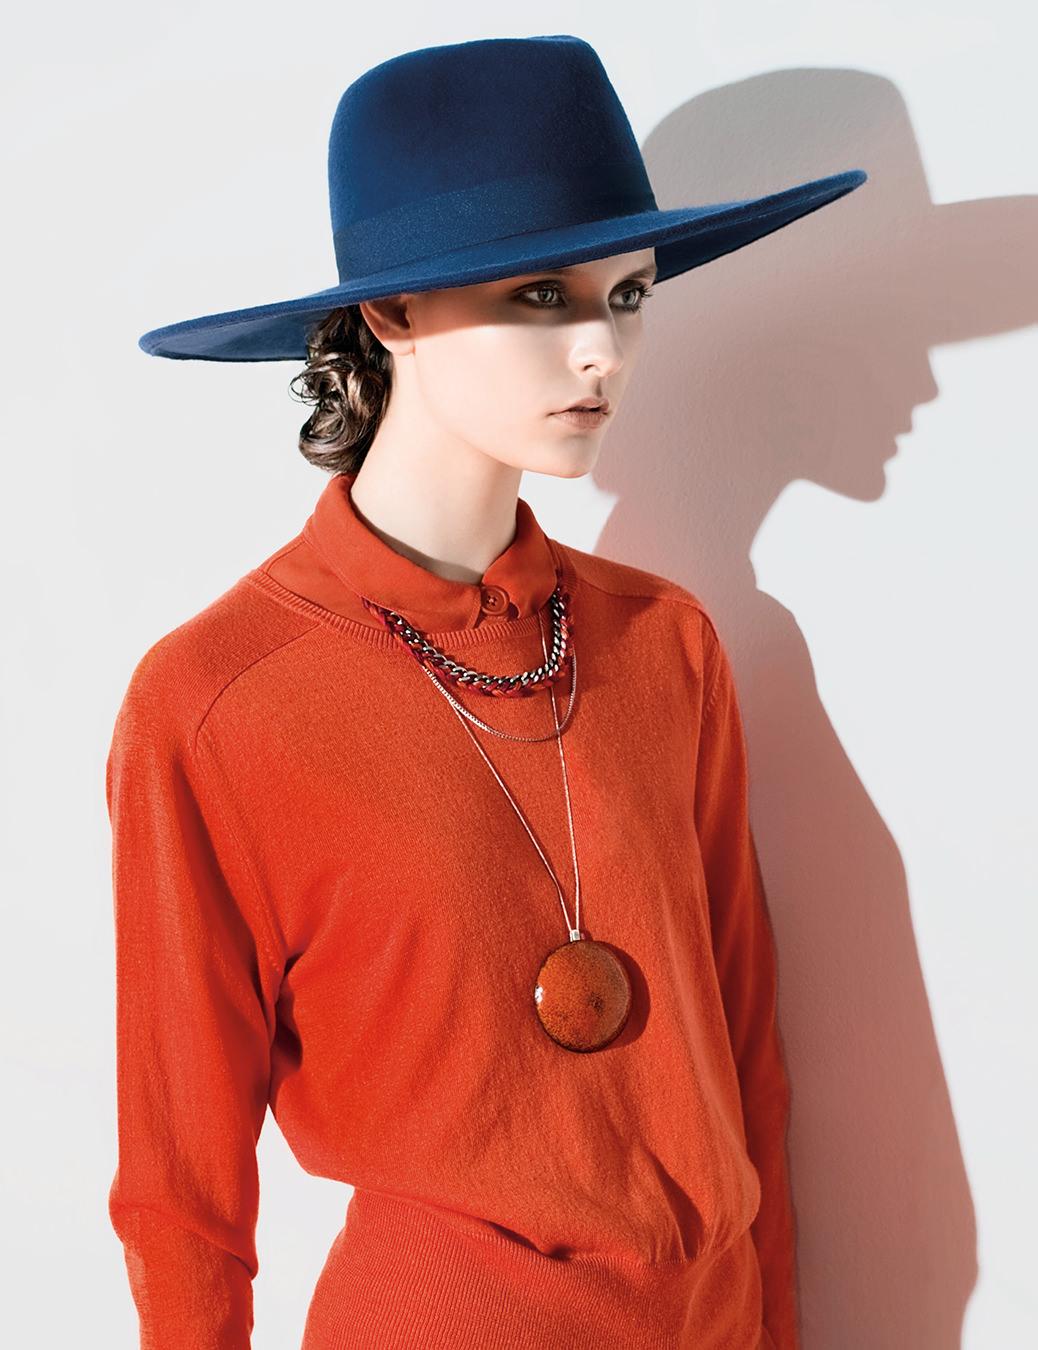 NUVO Magazine: Orange Crush, Spring Fashion